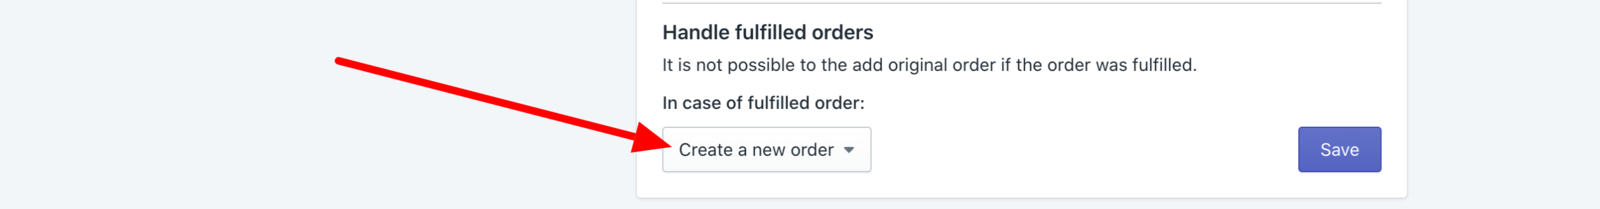 Handle fulfilled orders